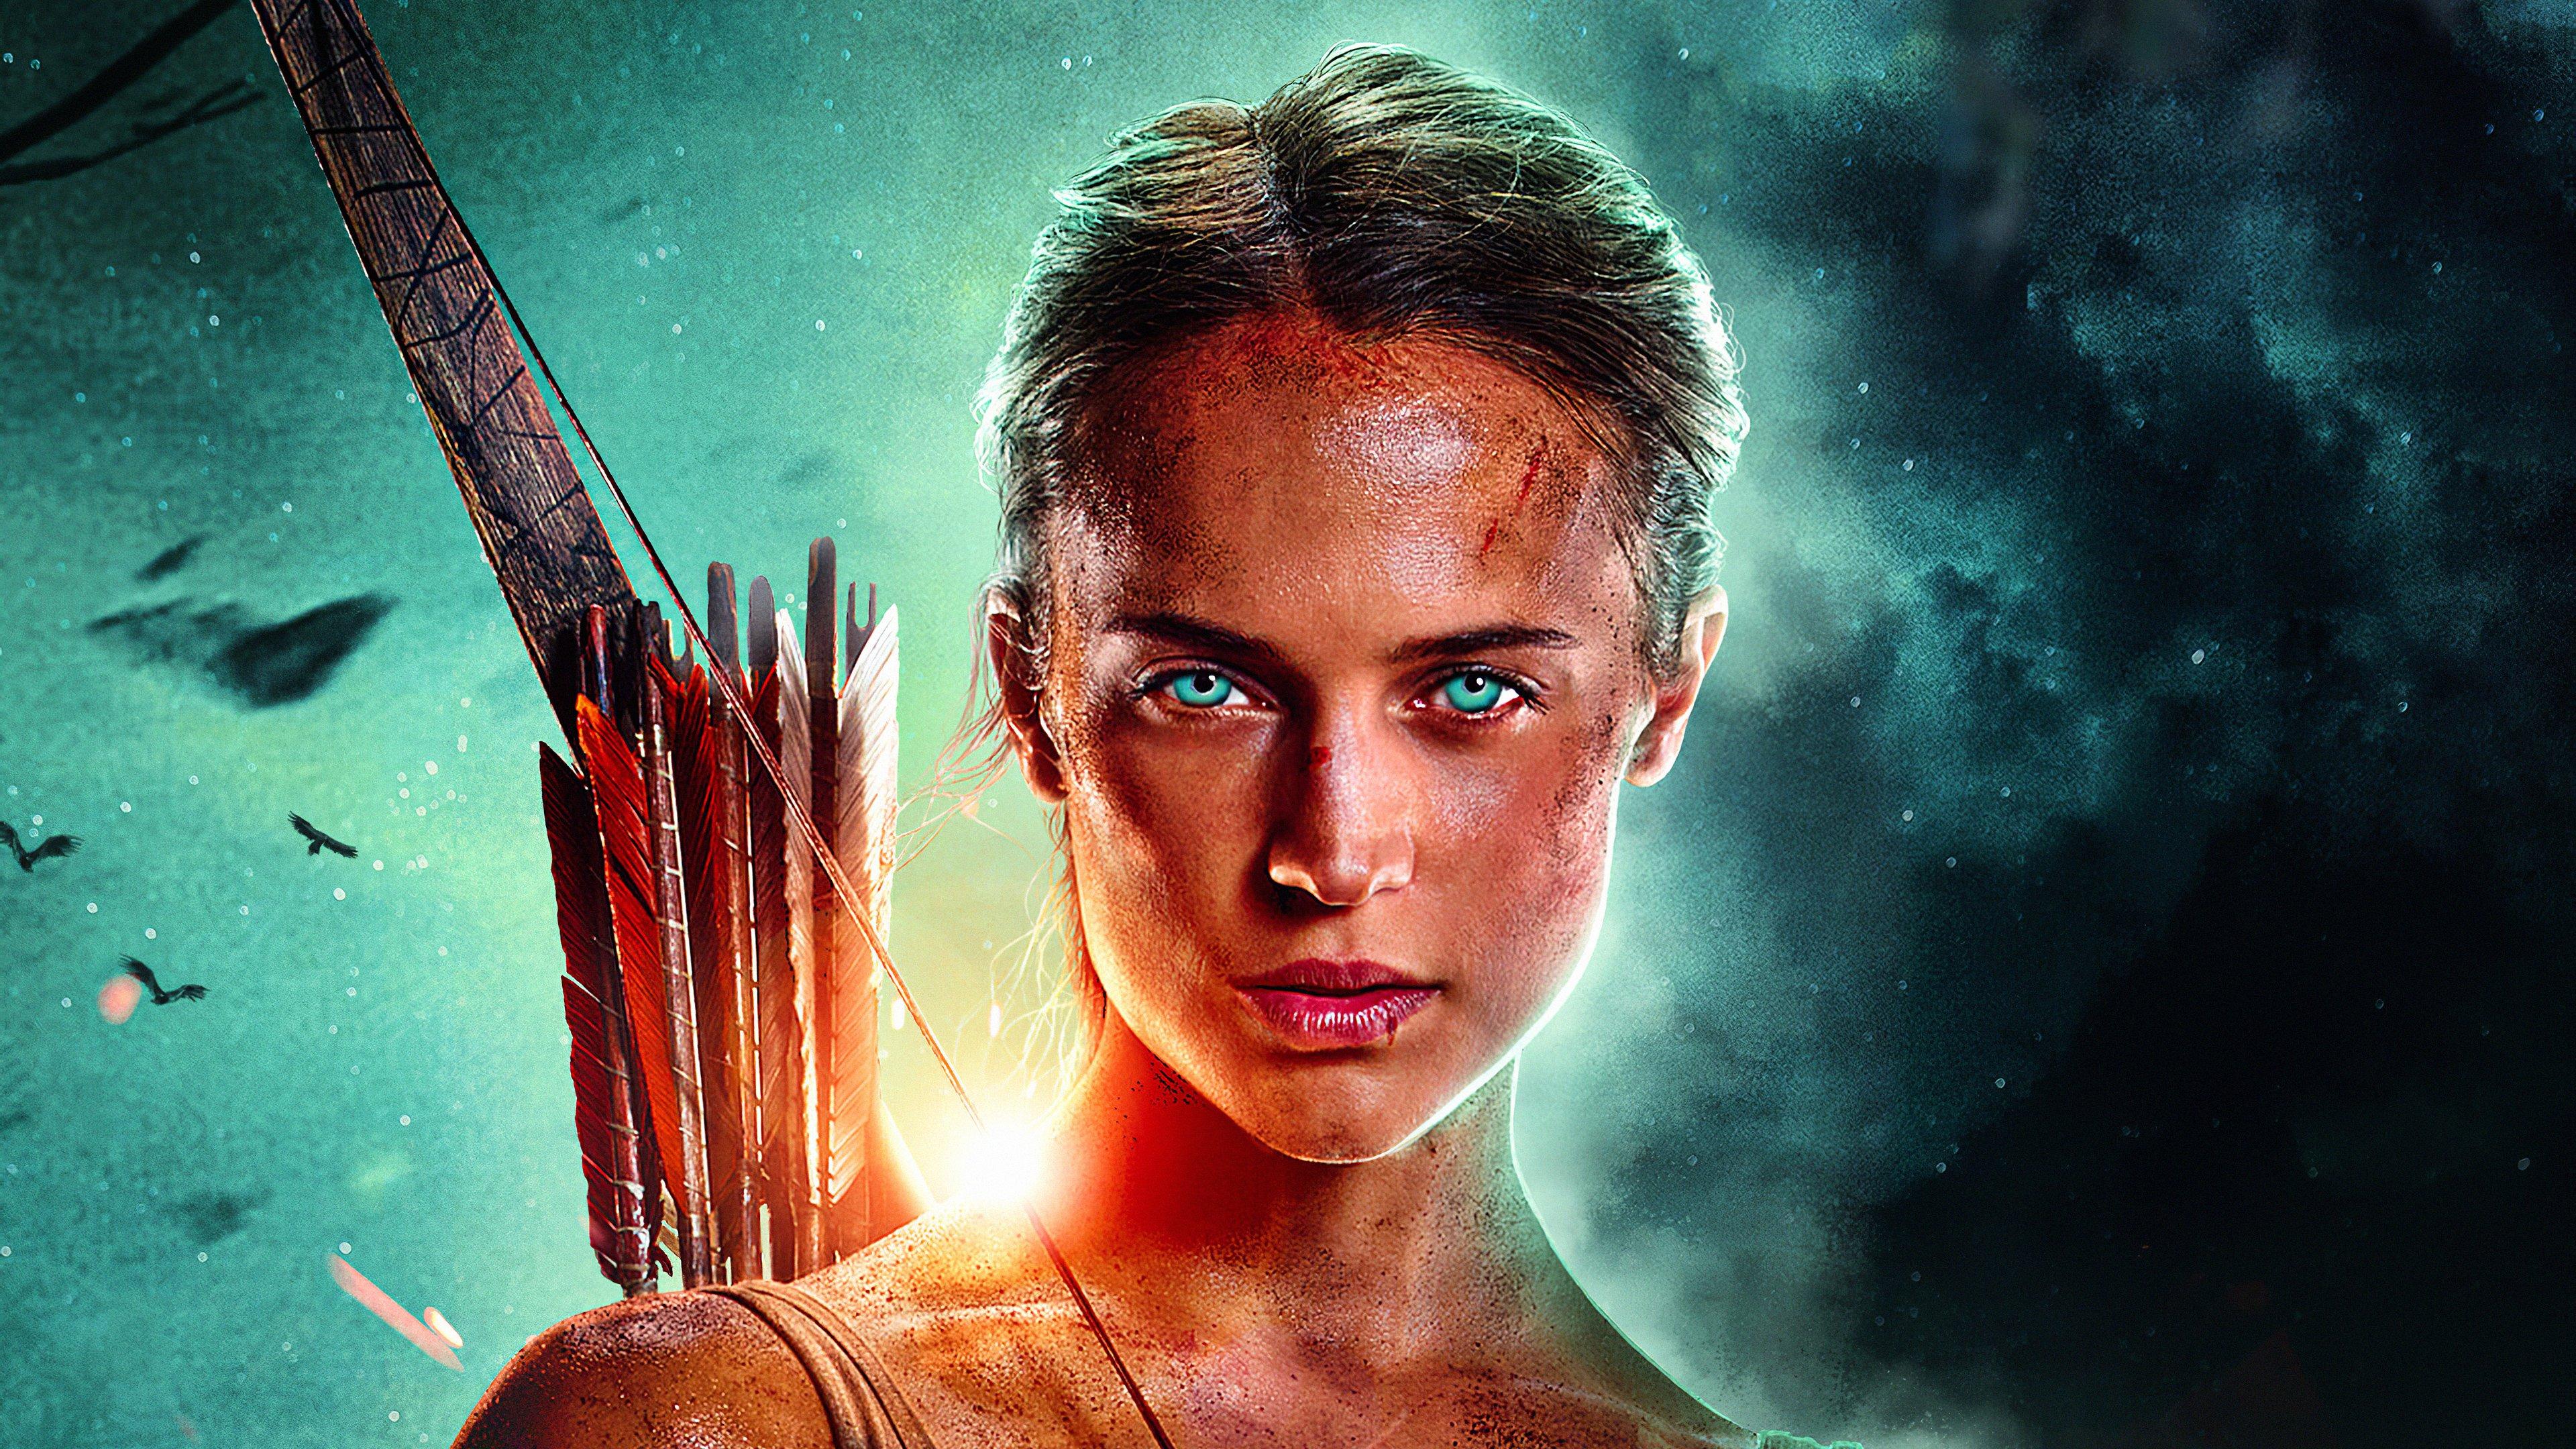 Wallpaper Lara Croft: Tomb Raider